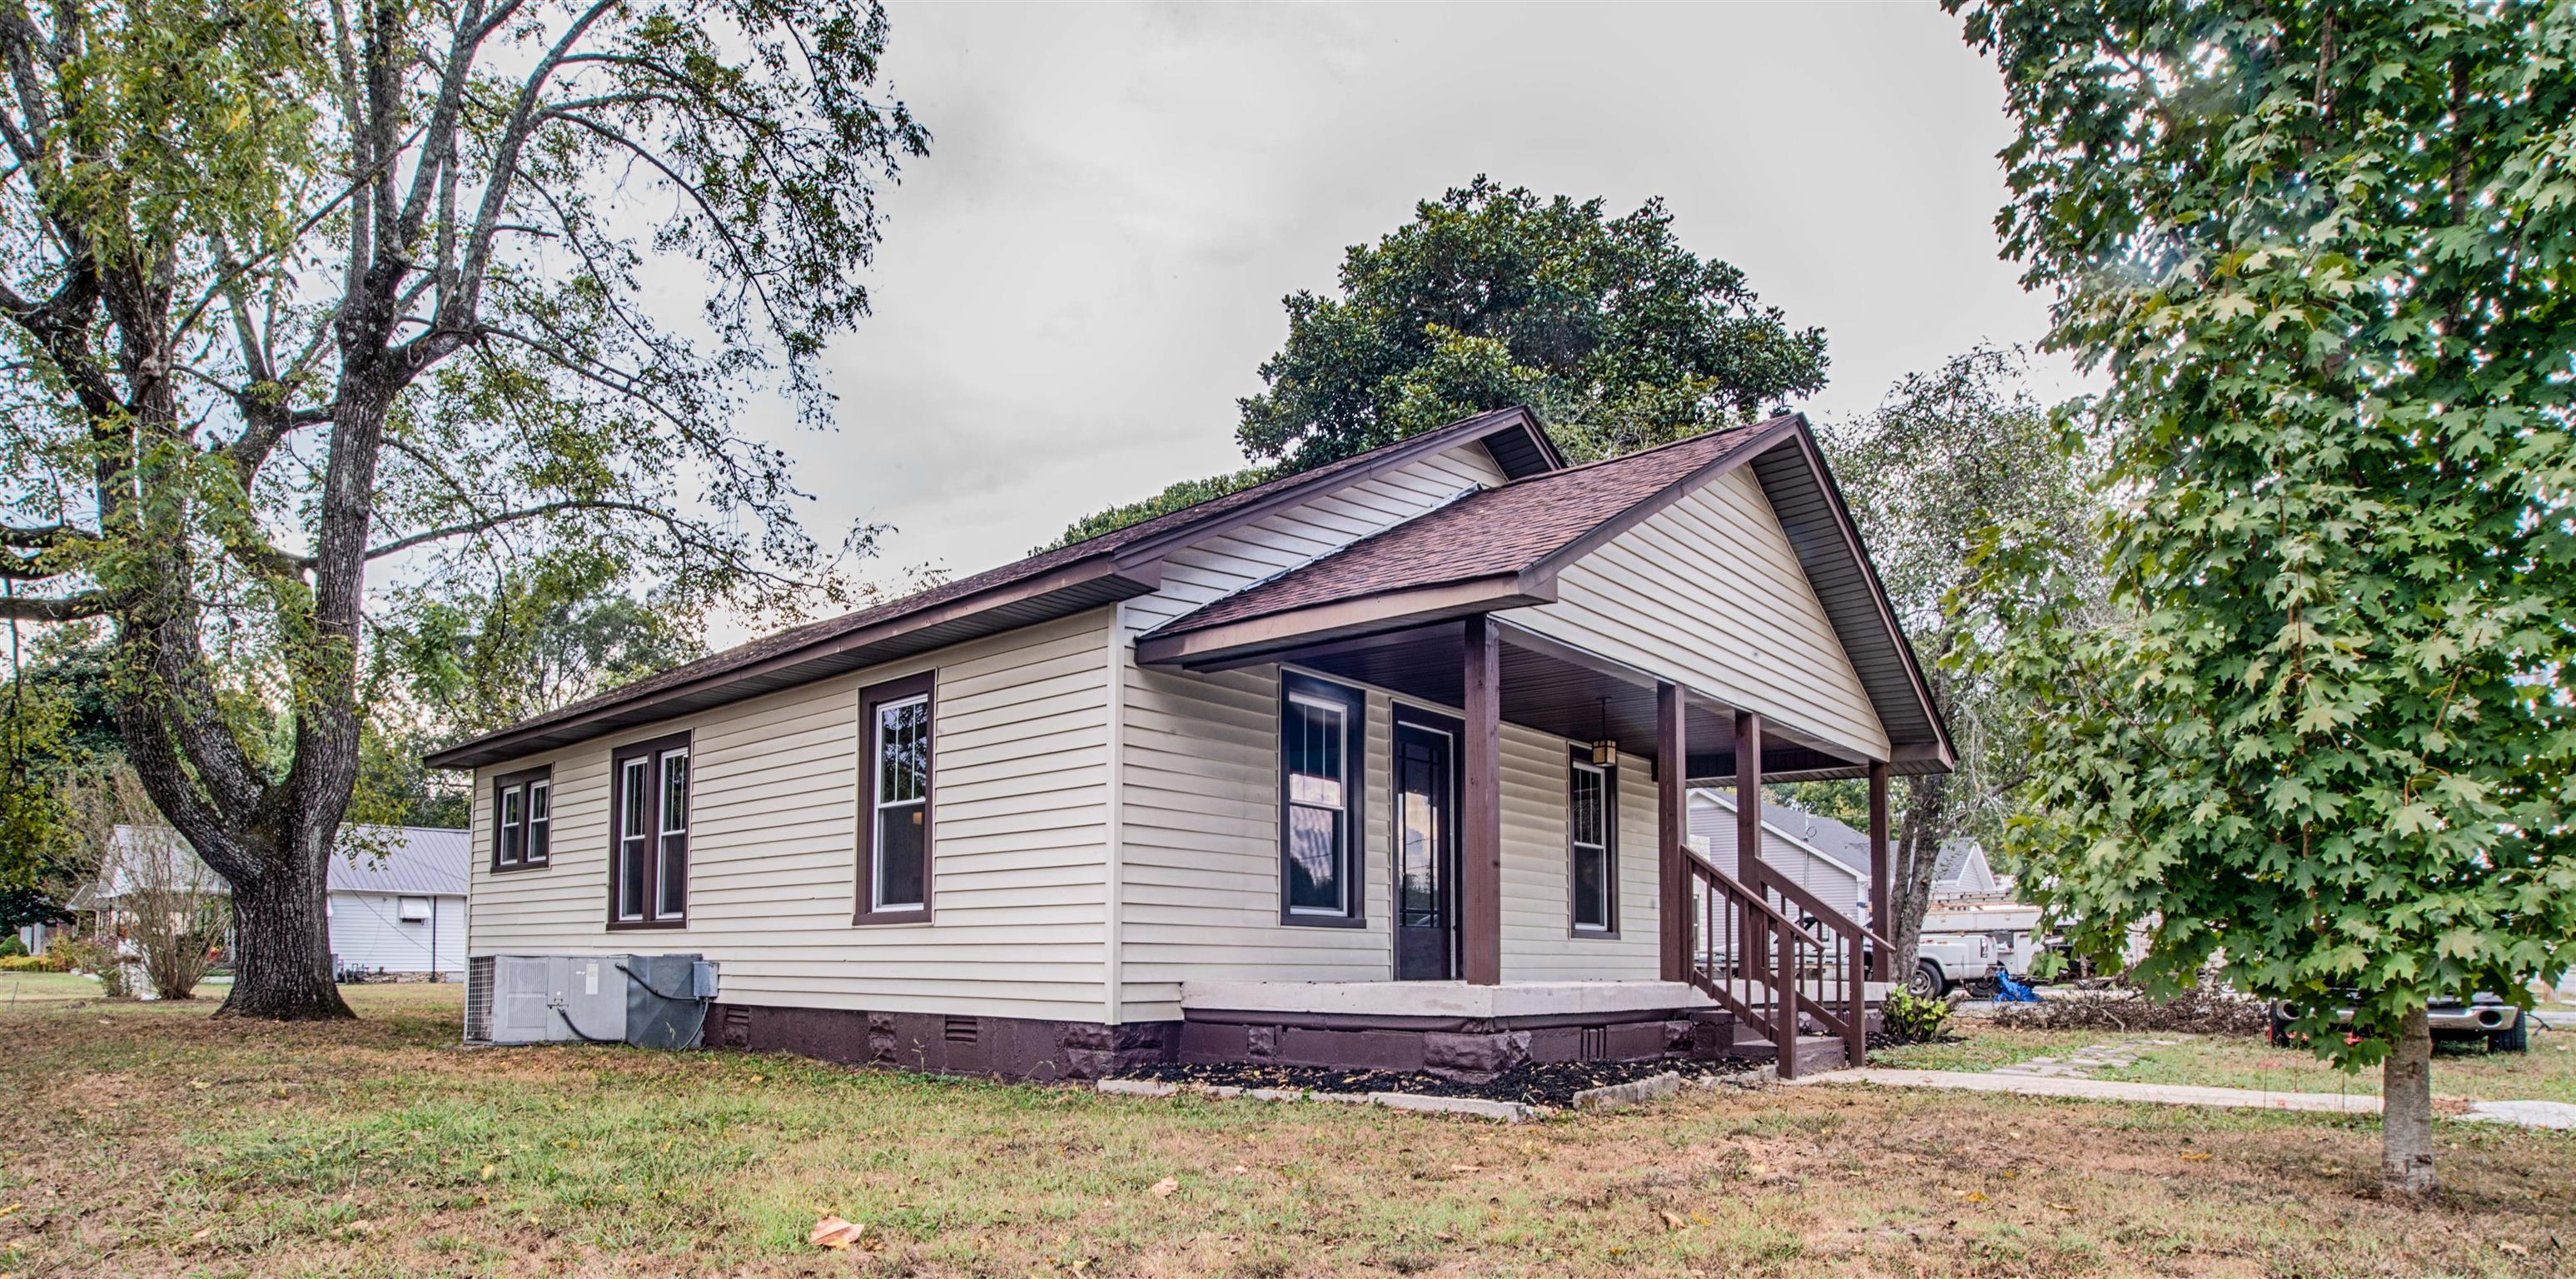 201 N Collins St, Tullahoma, TN 37388 - Tullahoma, TN real estate listing